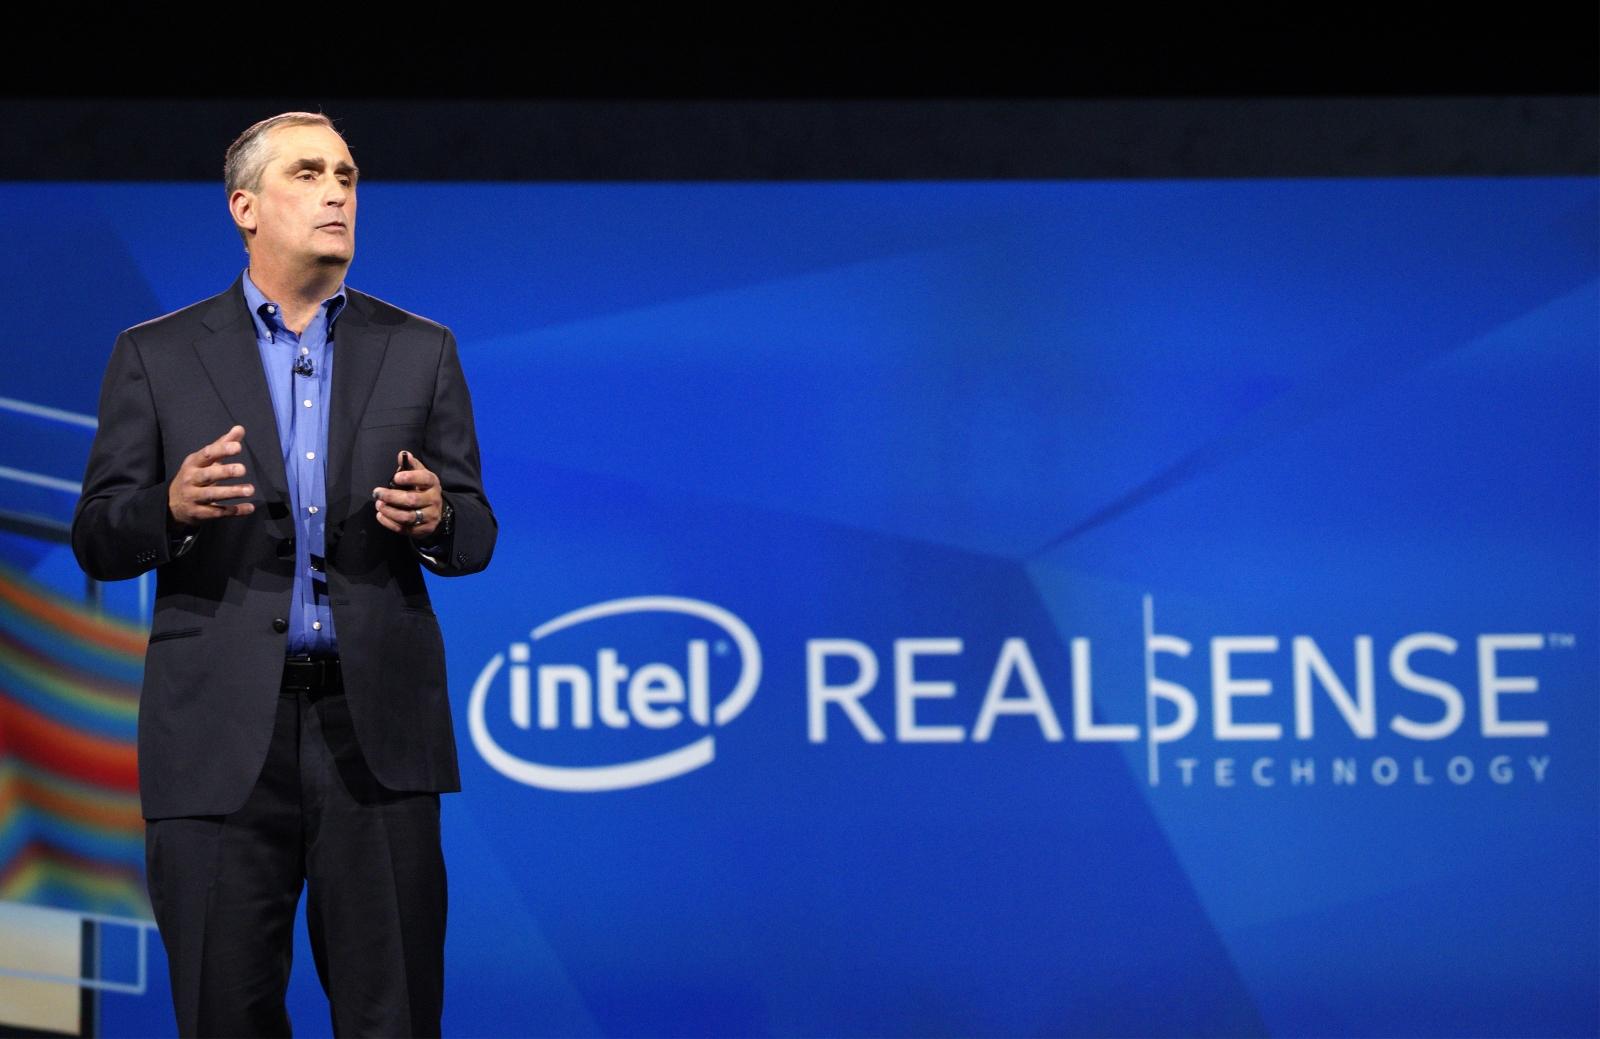 Intel Realsense will help drones avoid collision